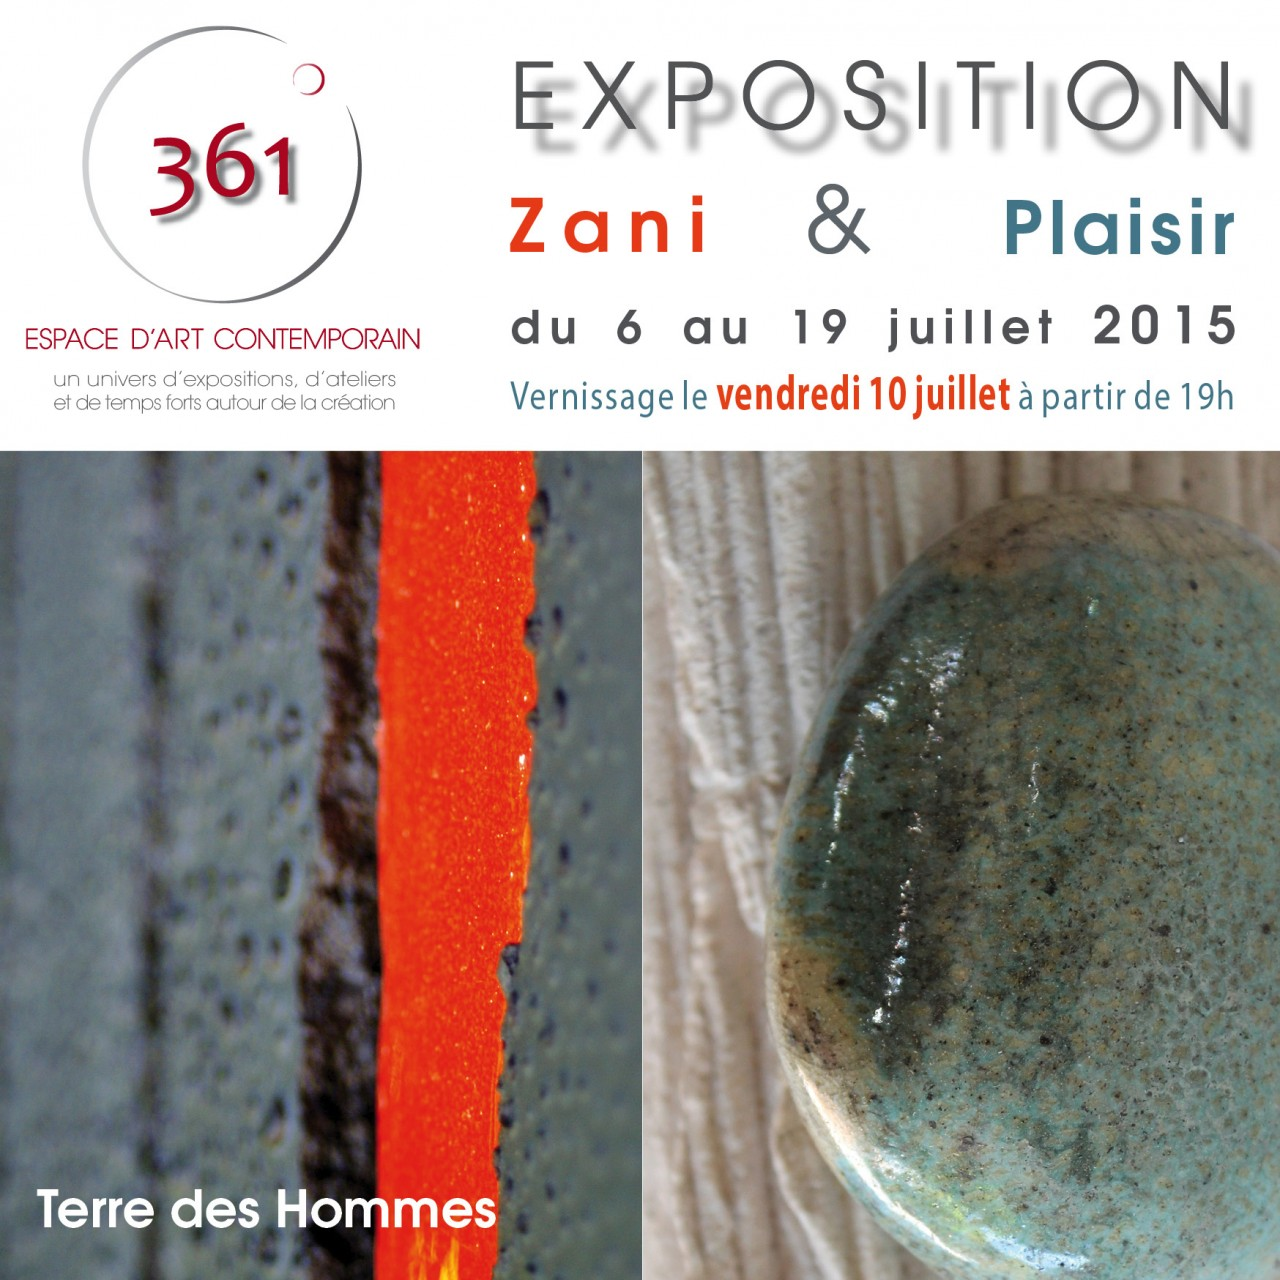 Expo Zani & Plaisir 2015